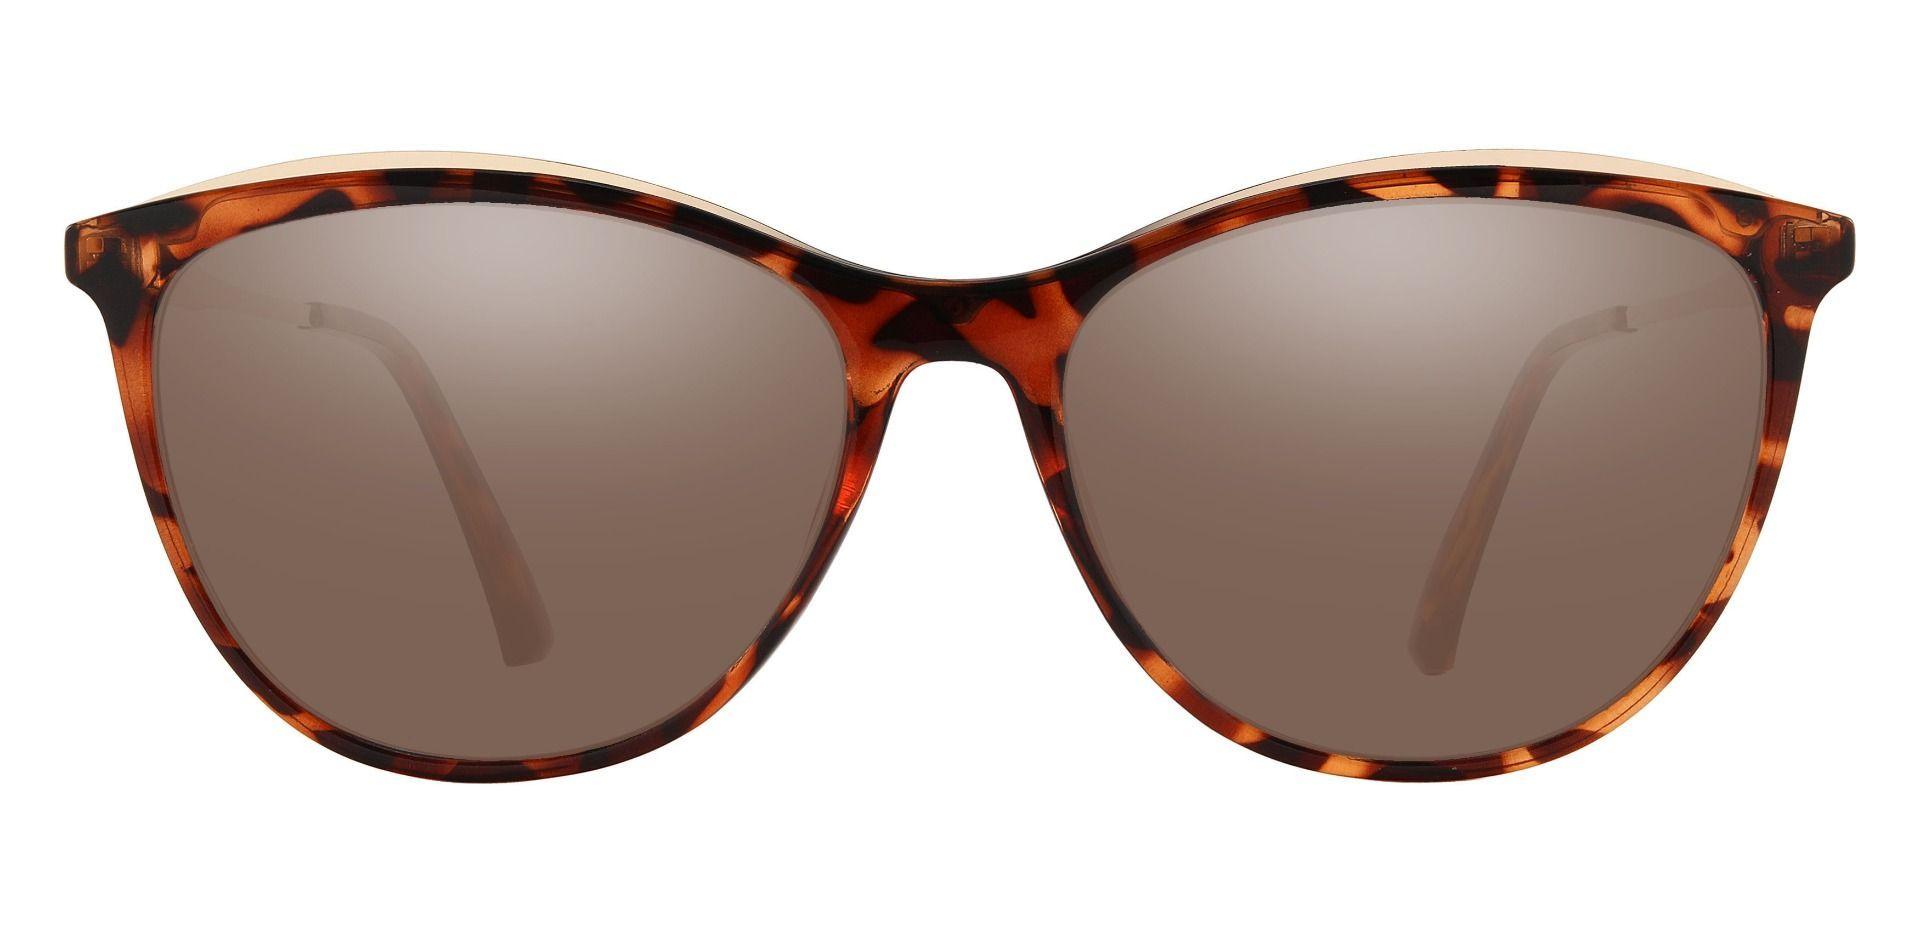 Snyder Oval Prescription Sunglasses - Tortoise Frame With Brown Lenses